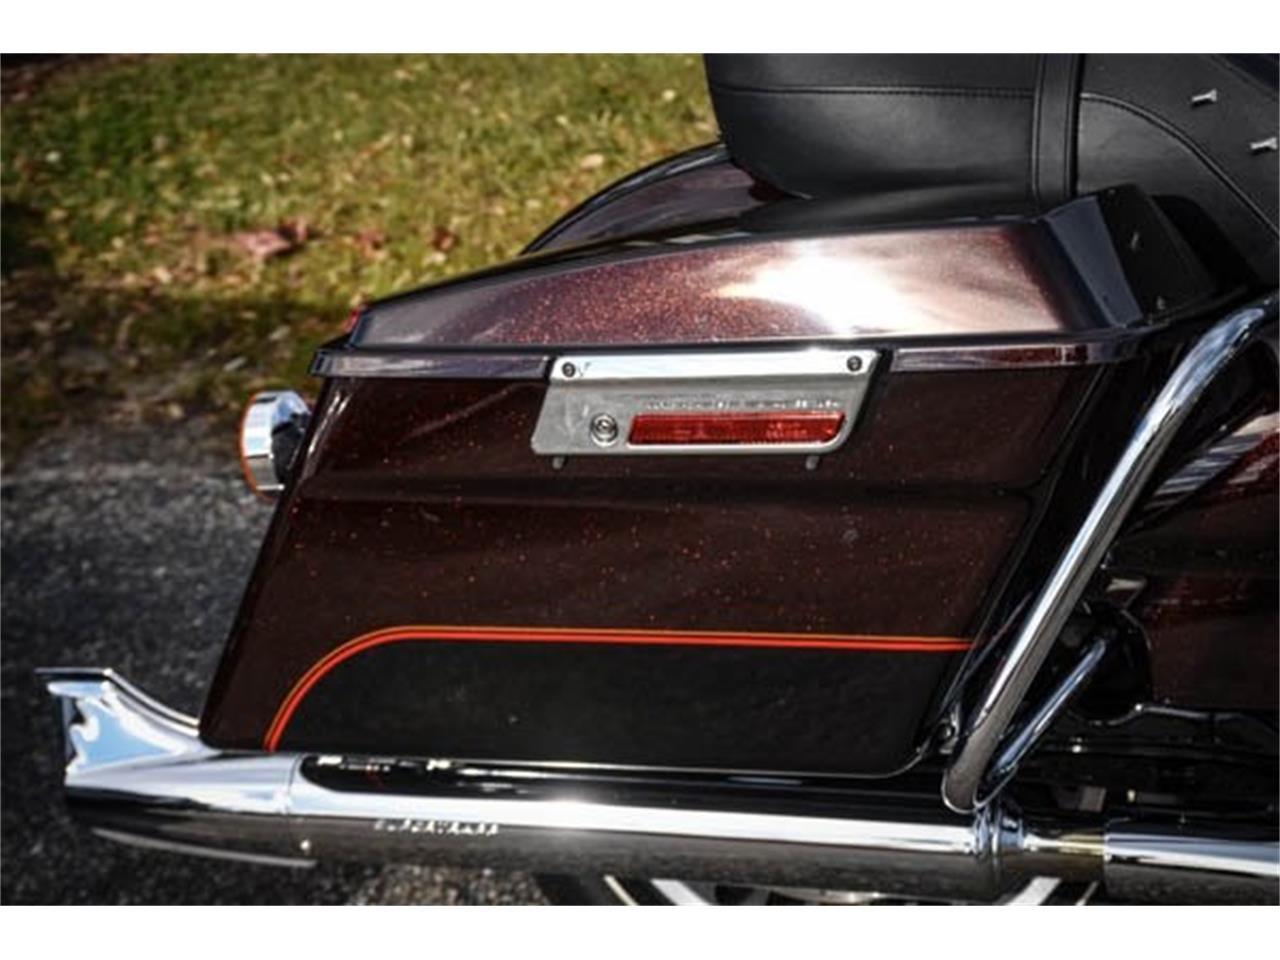 1981 Harley-Davidson Road King (CC-1304067) for sale in Little River, South Carolina